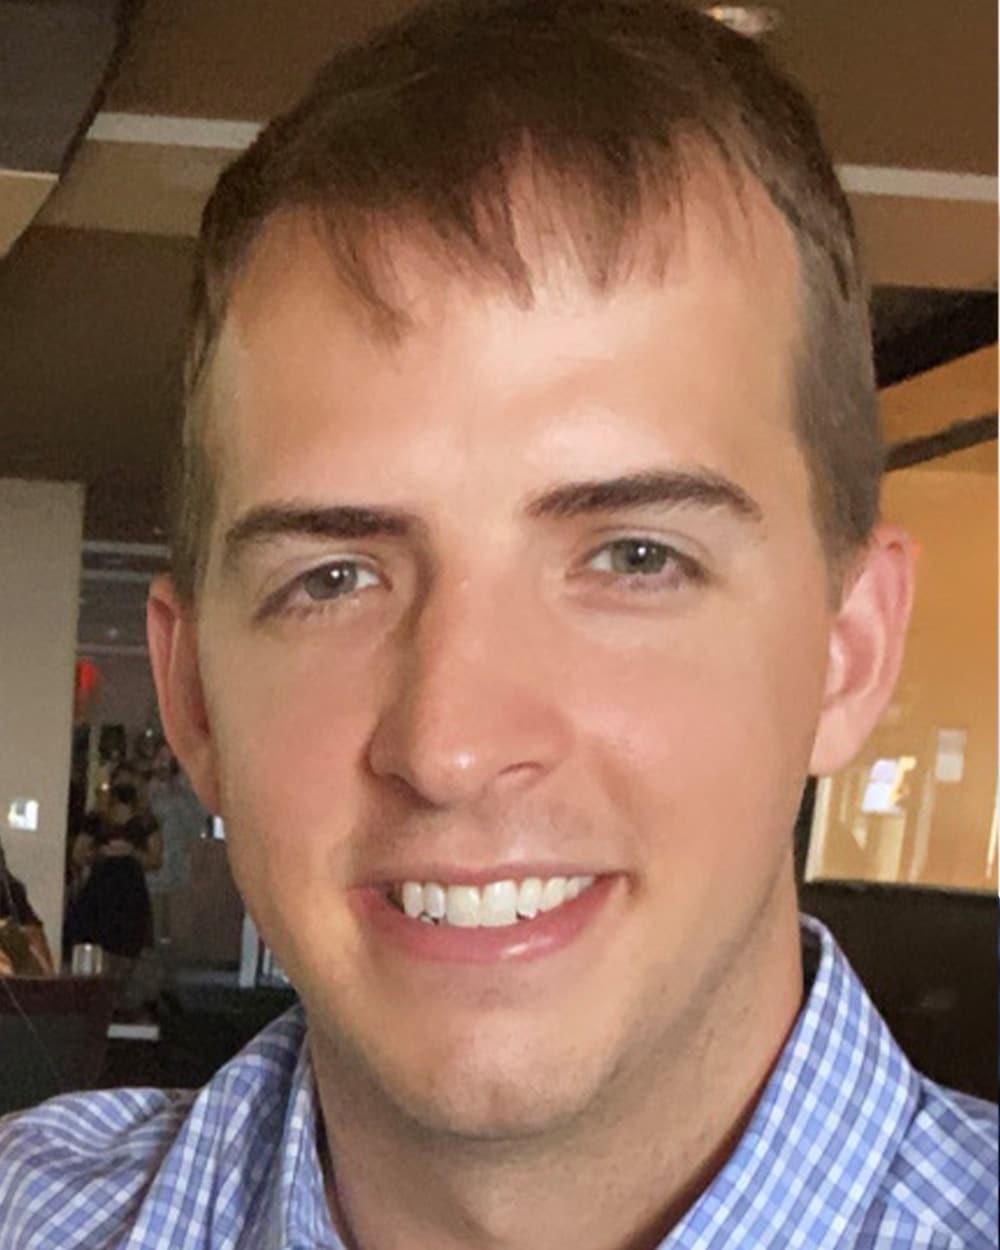 keegan bradley md - Fort Worth EM Residency Program